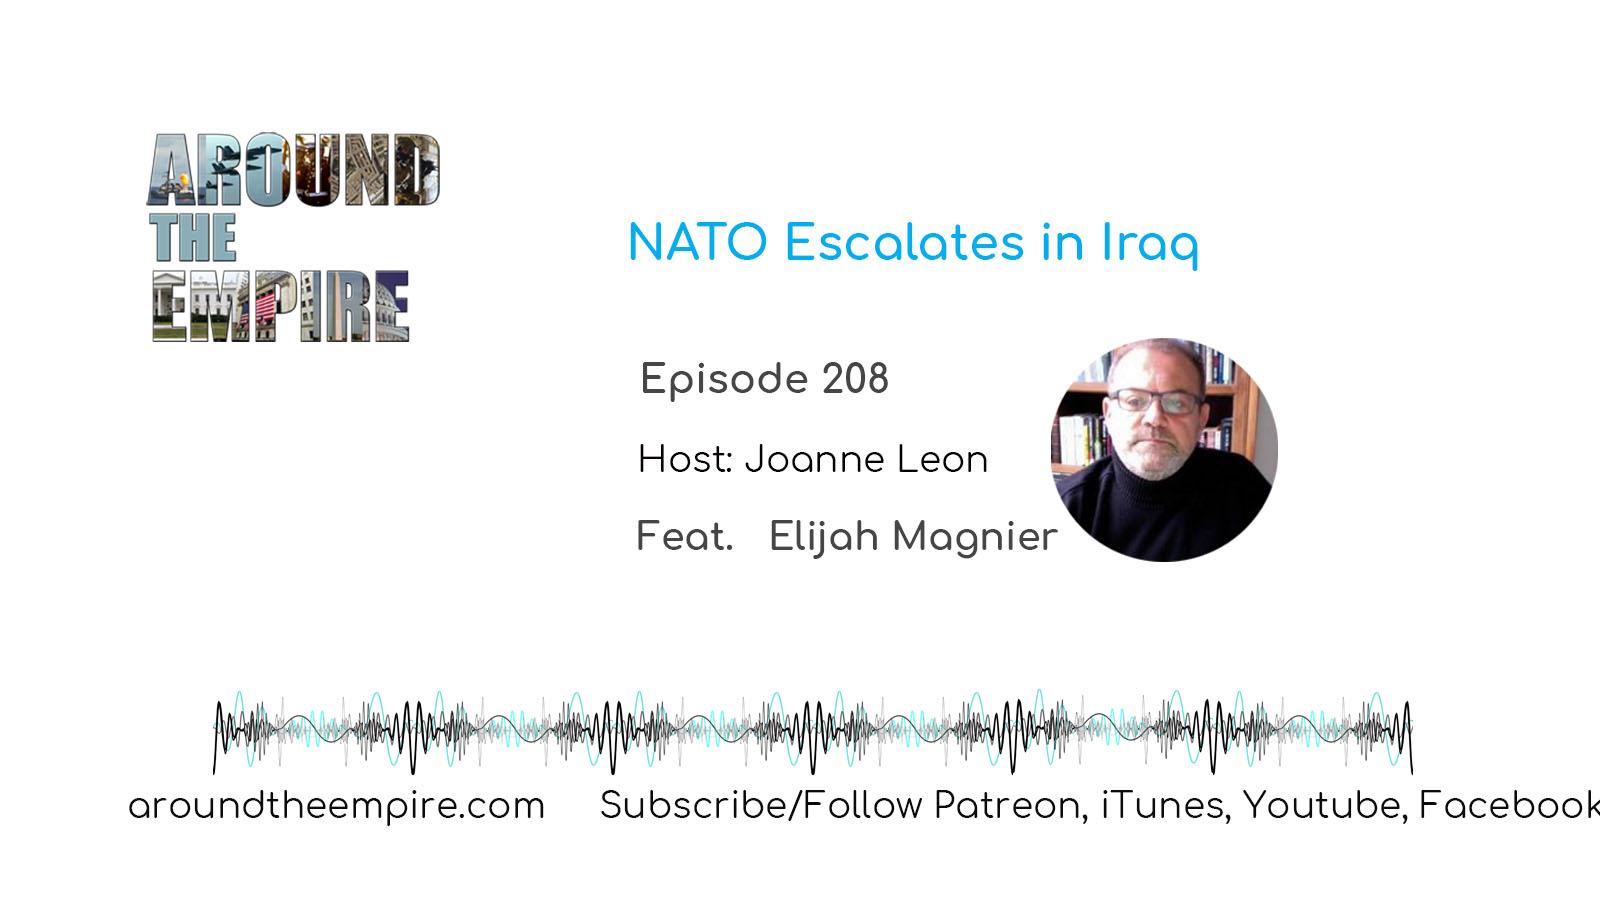 Ep 208: NATO Escalates in Iraq feat Elijah Magnier